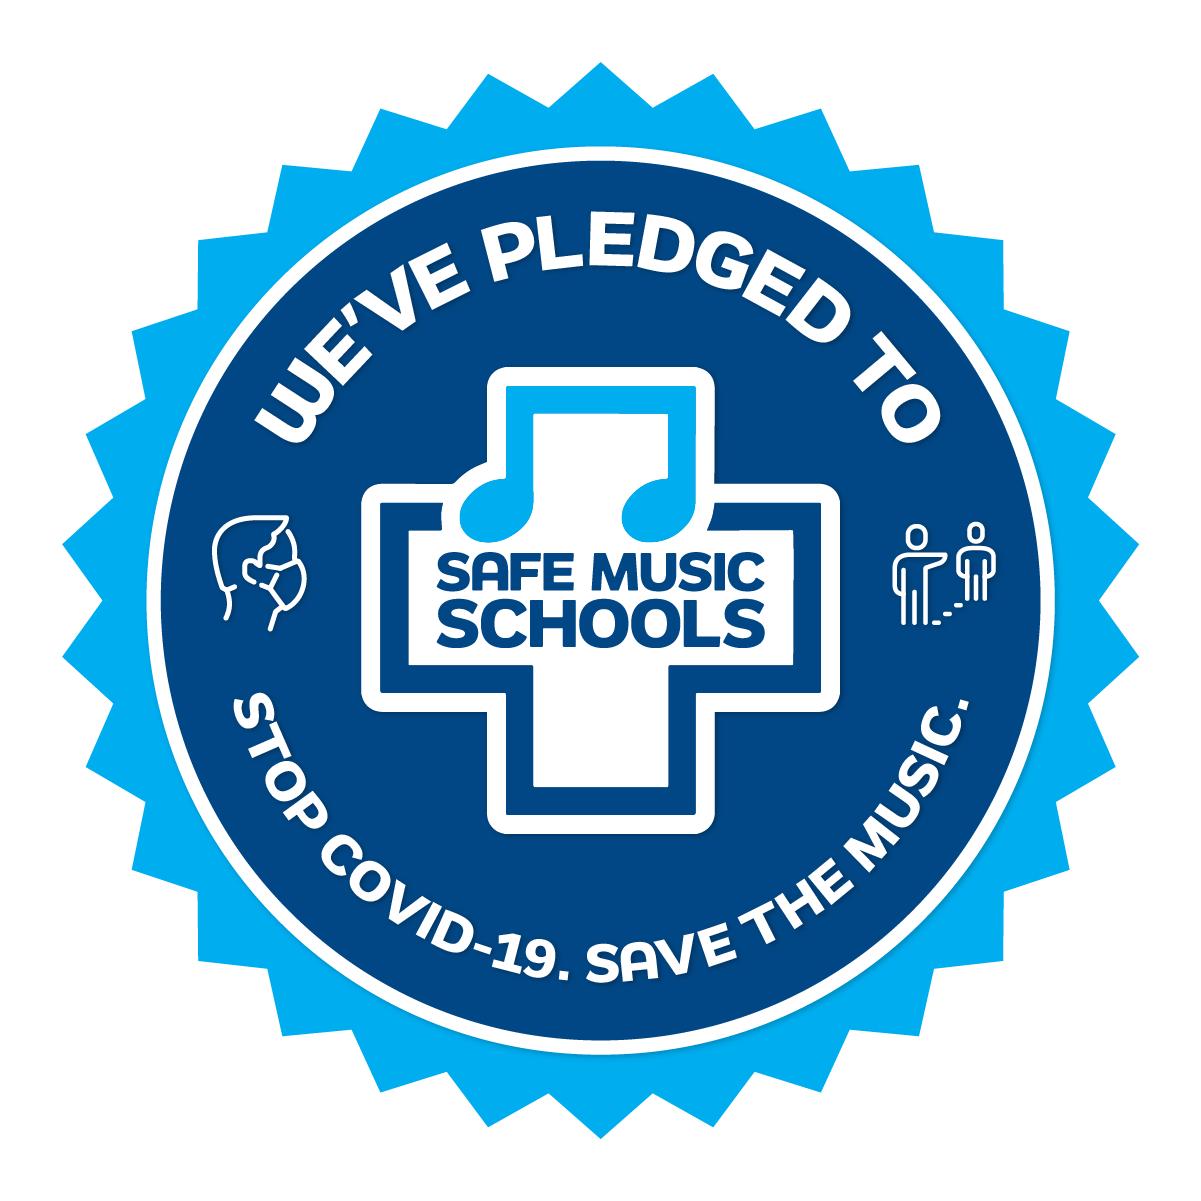 Boston School of Music Arts is  Covid19 safe music school